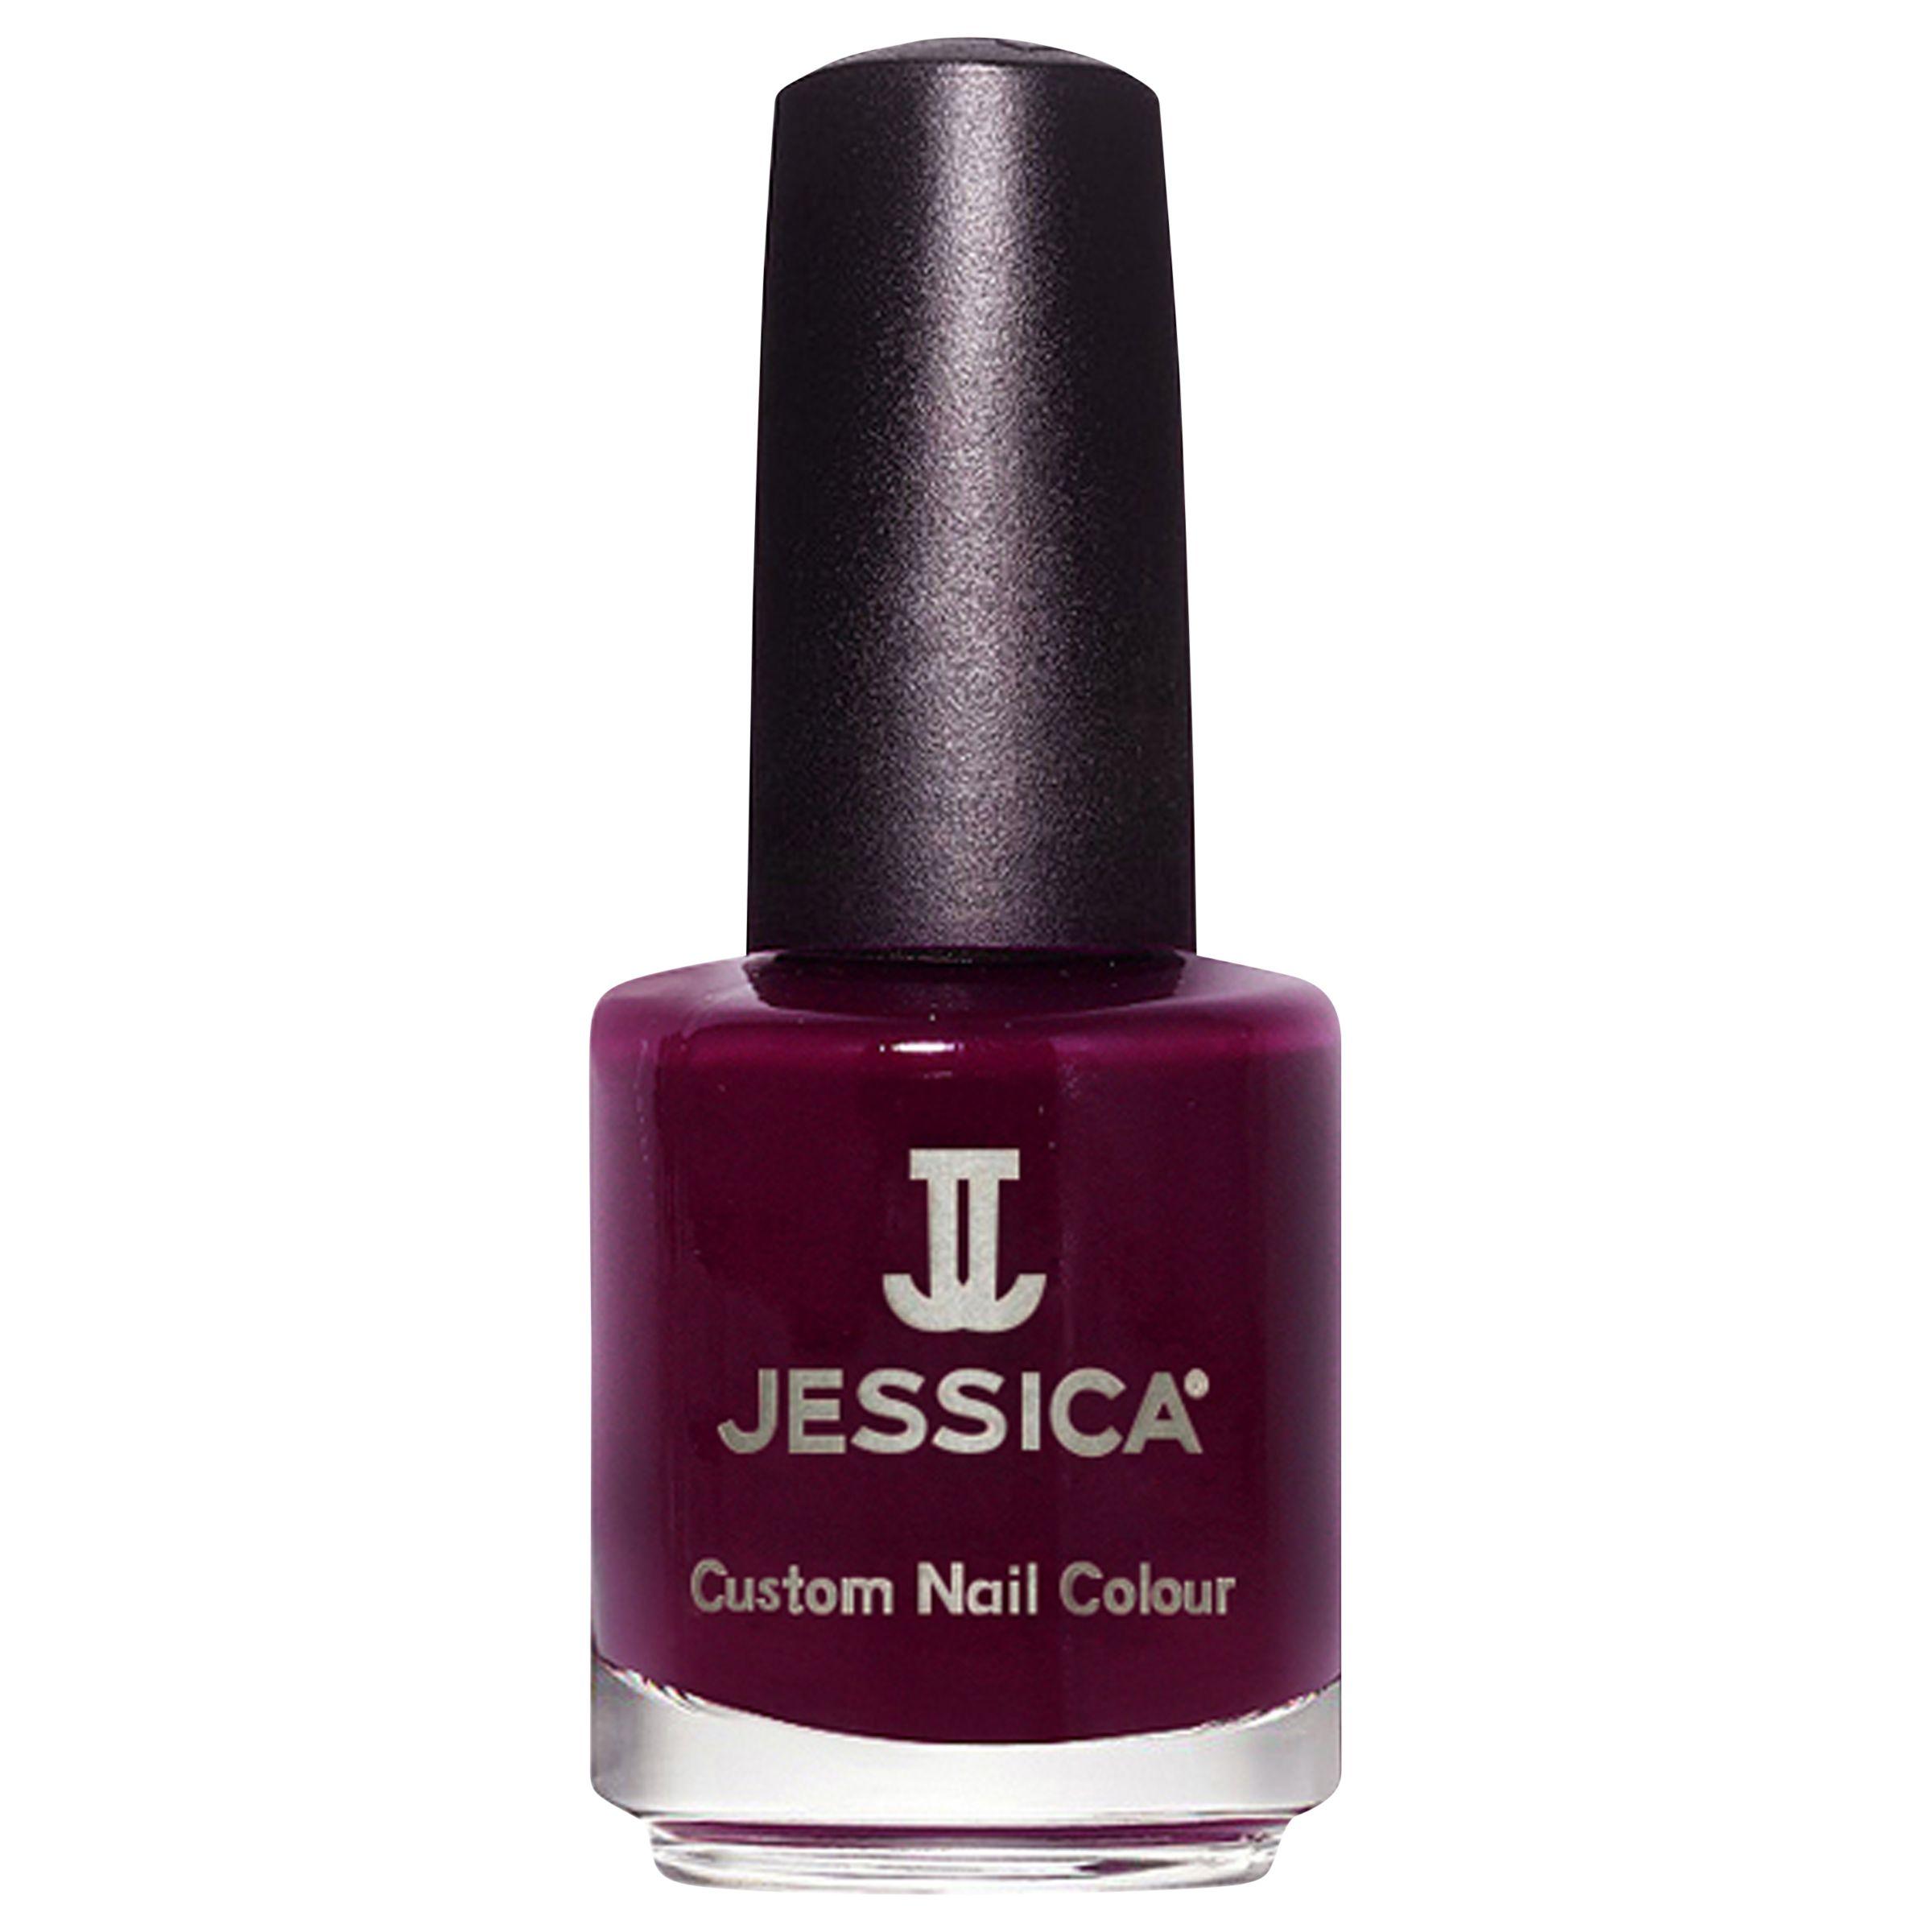 Jessica Jessica Custom Nail Colour - Berries